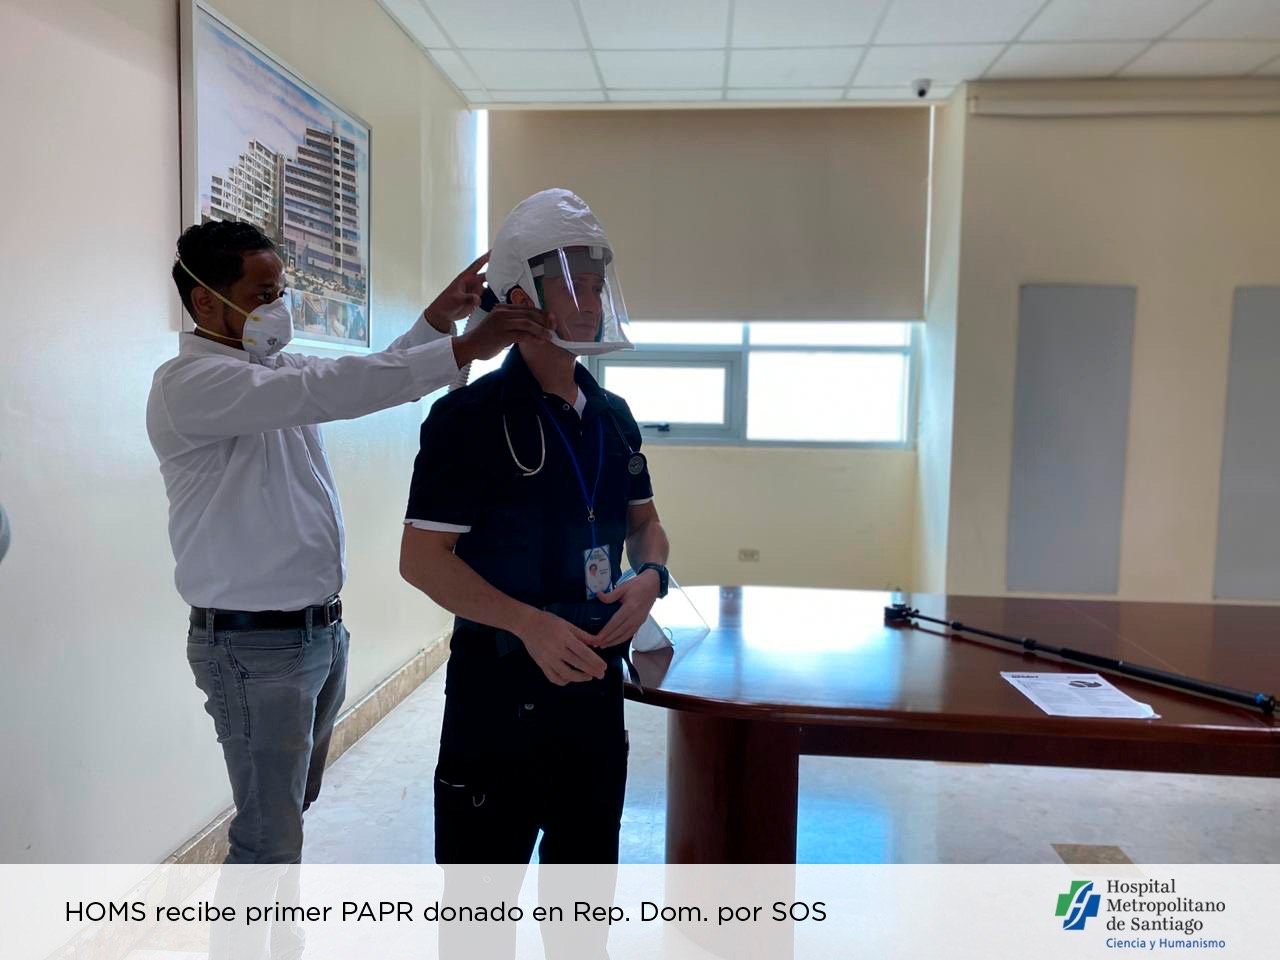 El HOMS recibe primer equipo de respiradores purificadores de aire motorizado